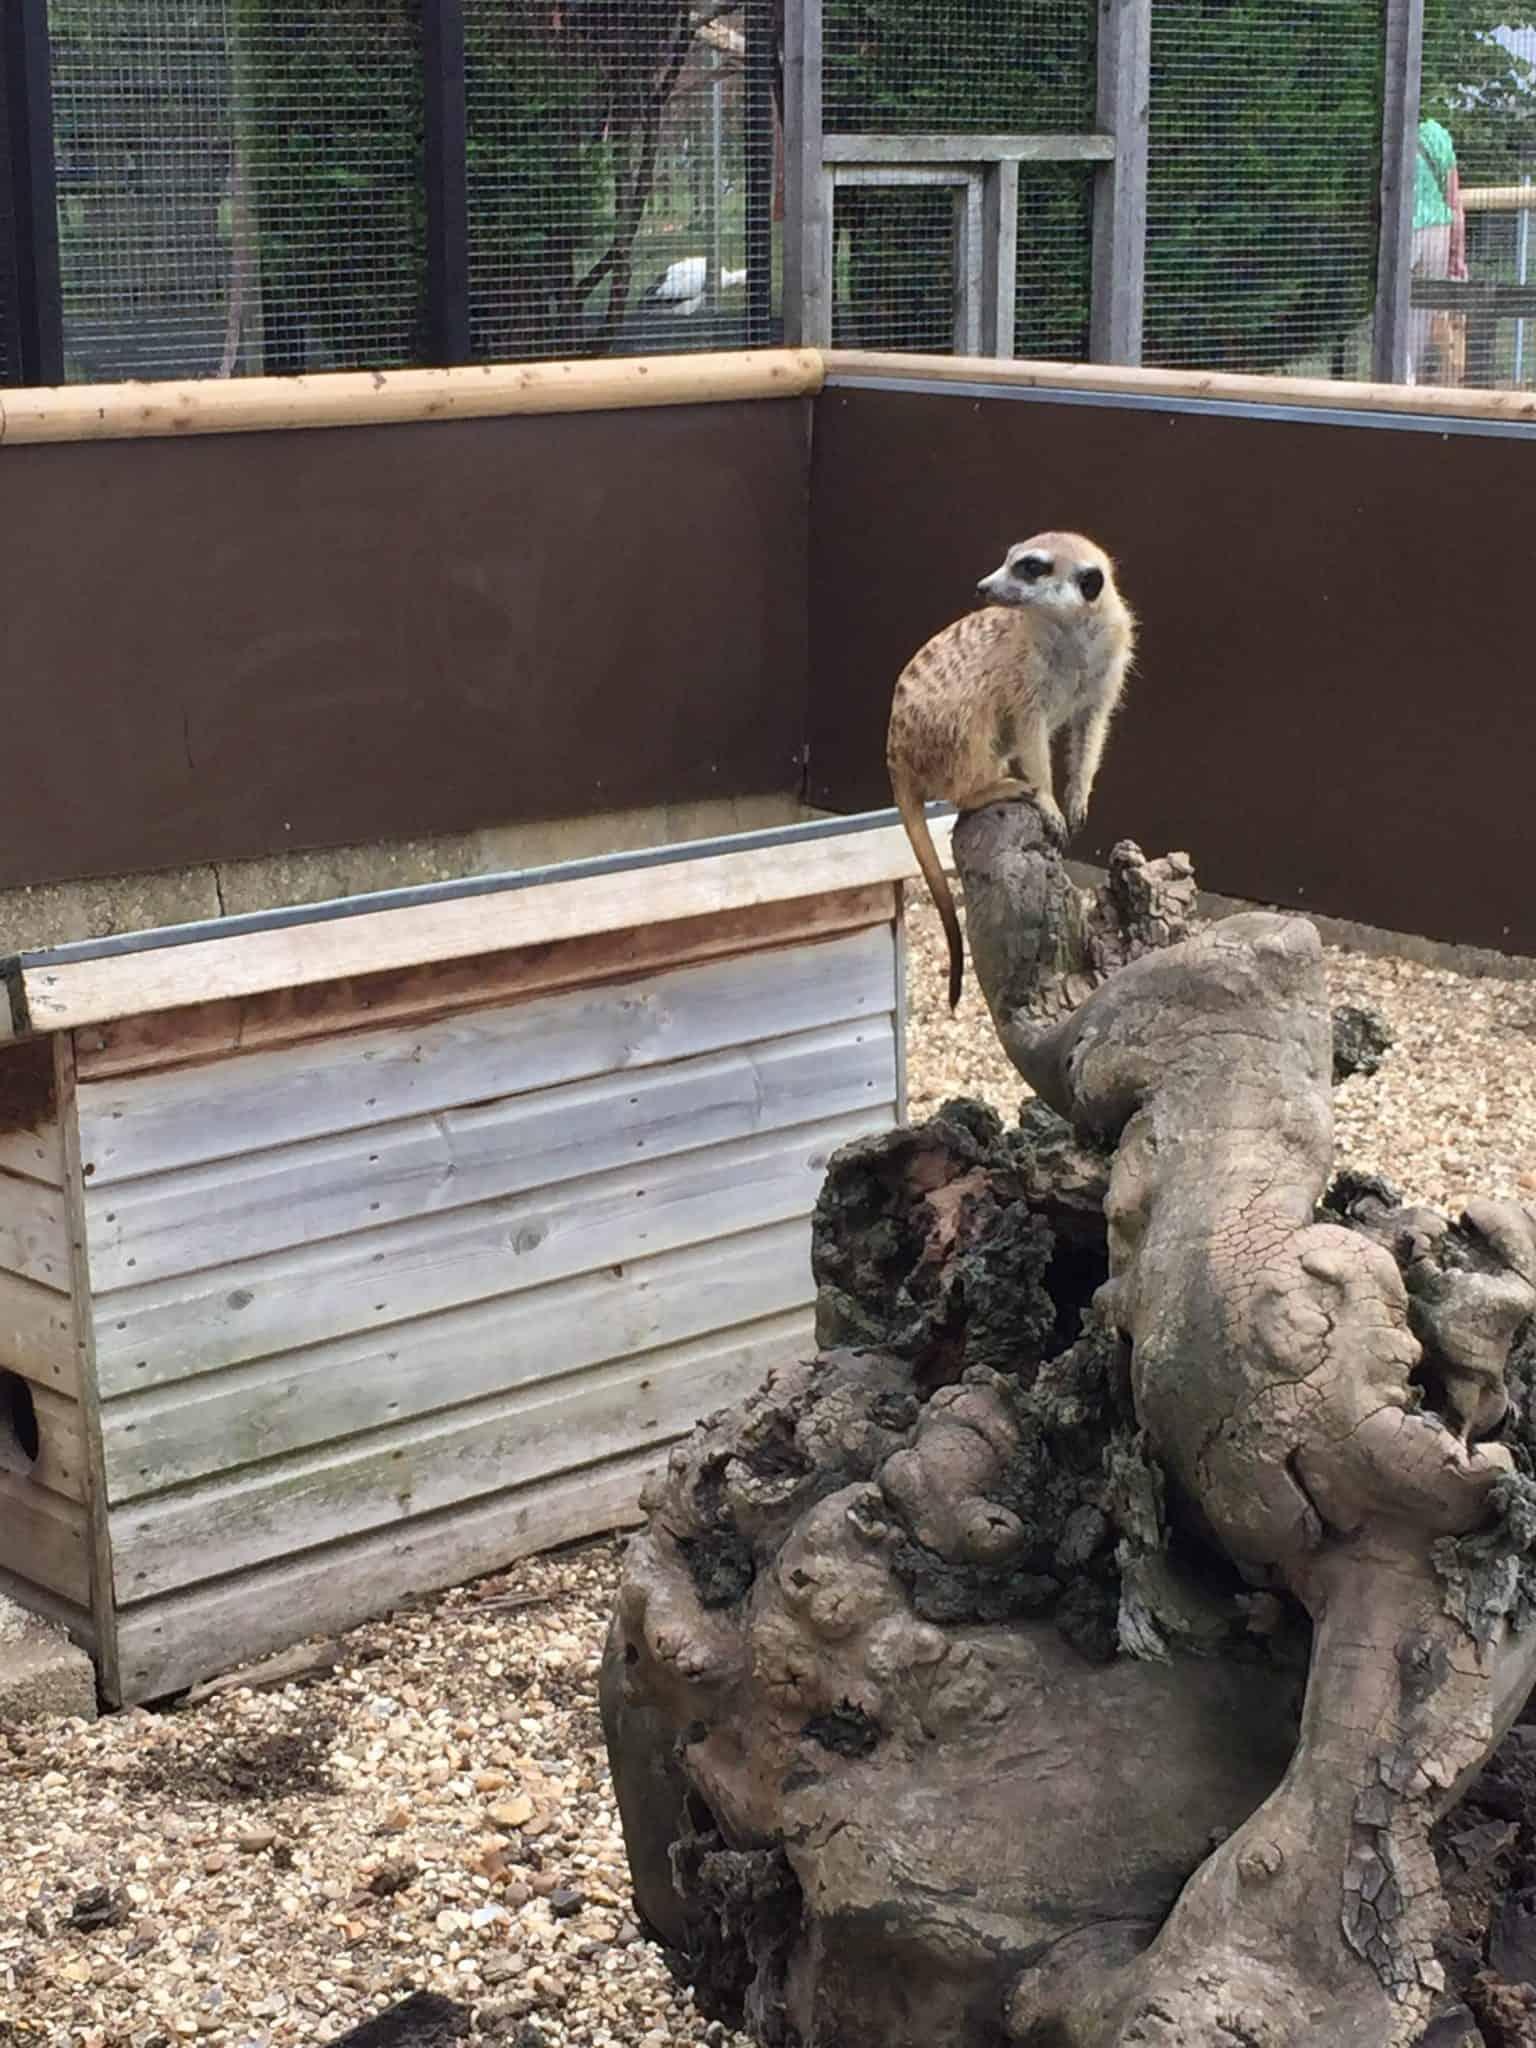 Hamerton Zoo Park – Meerkat